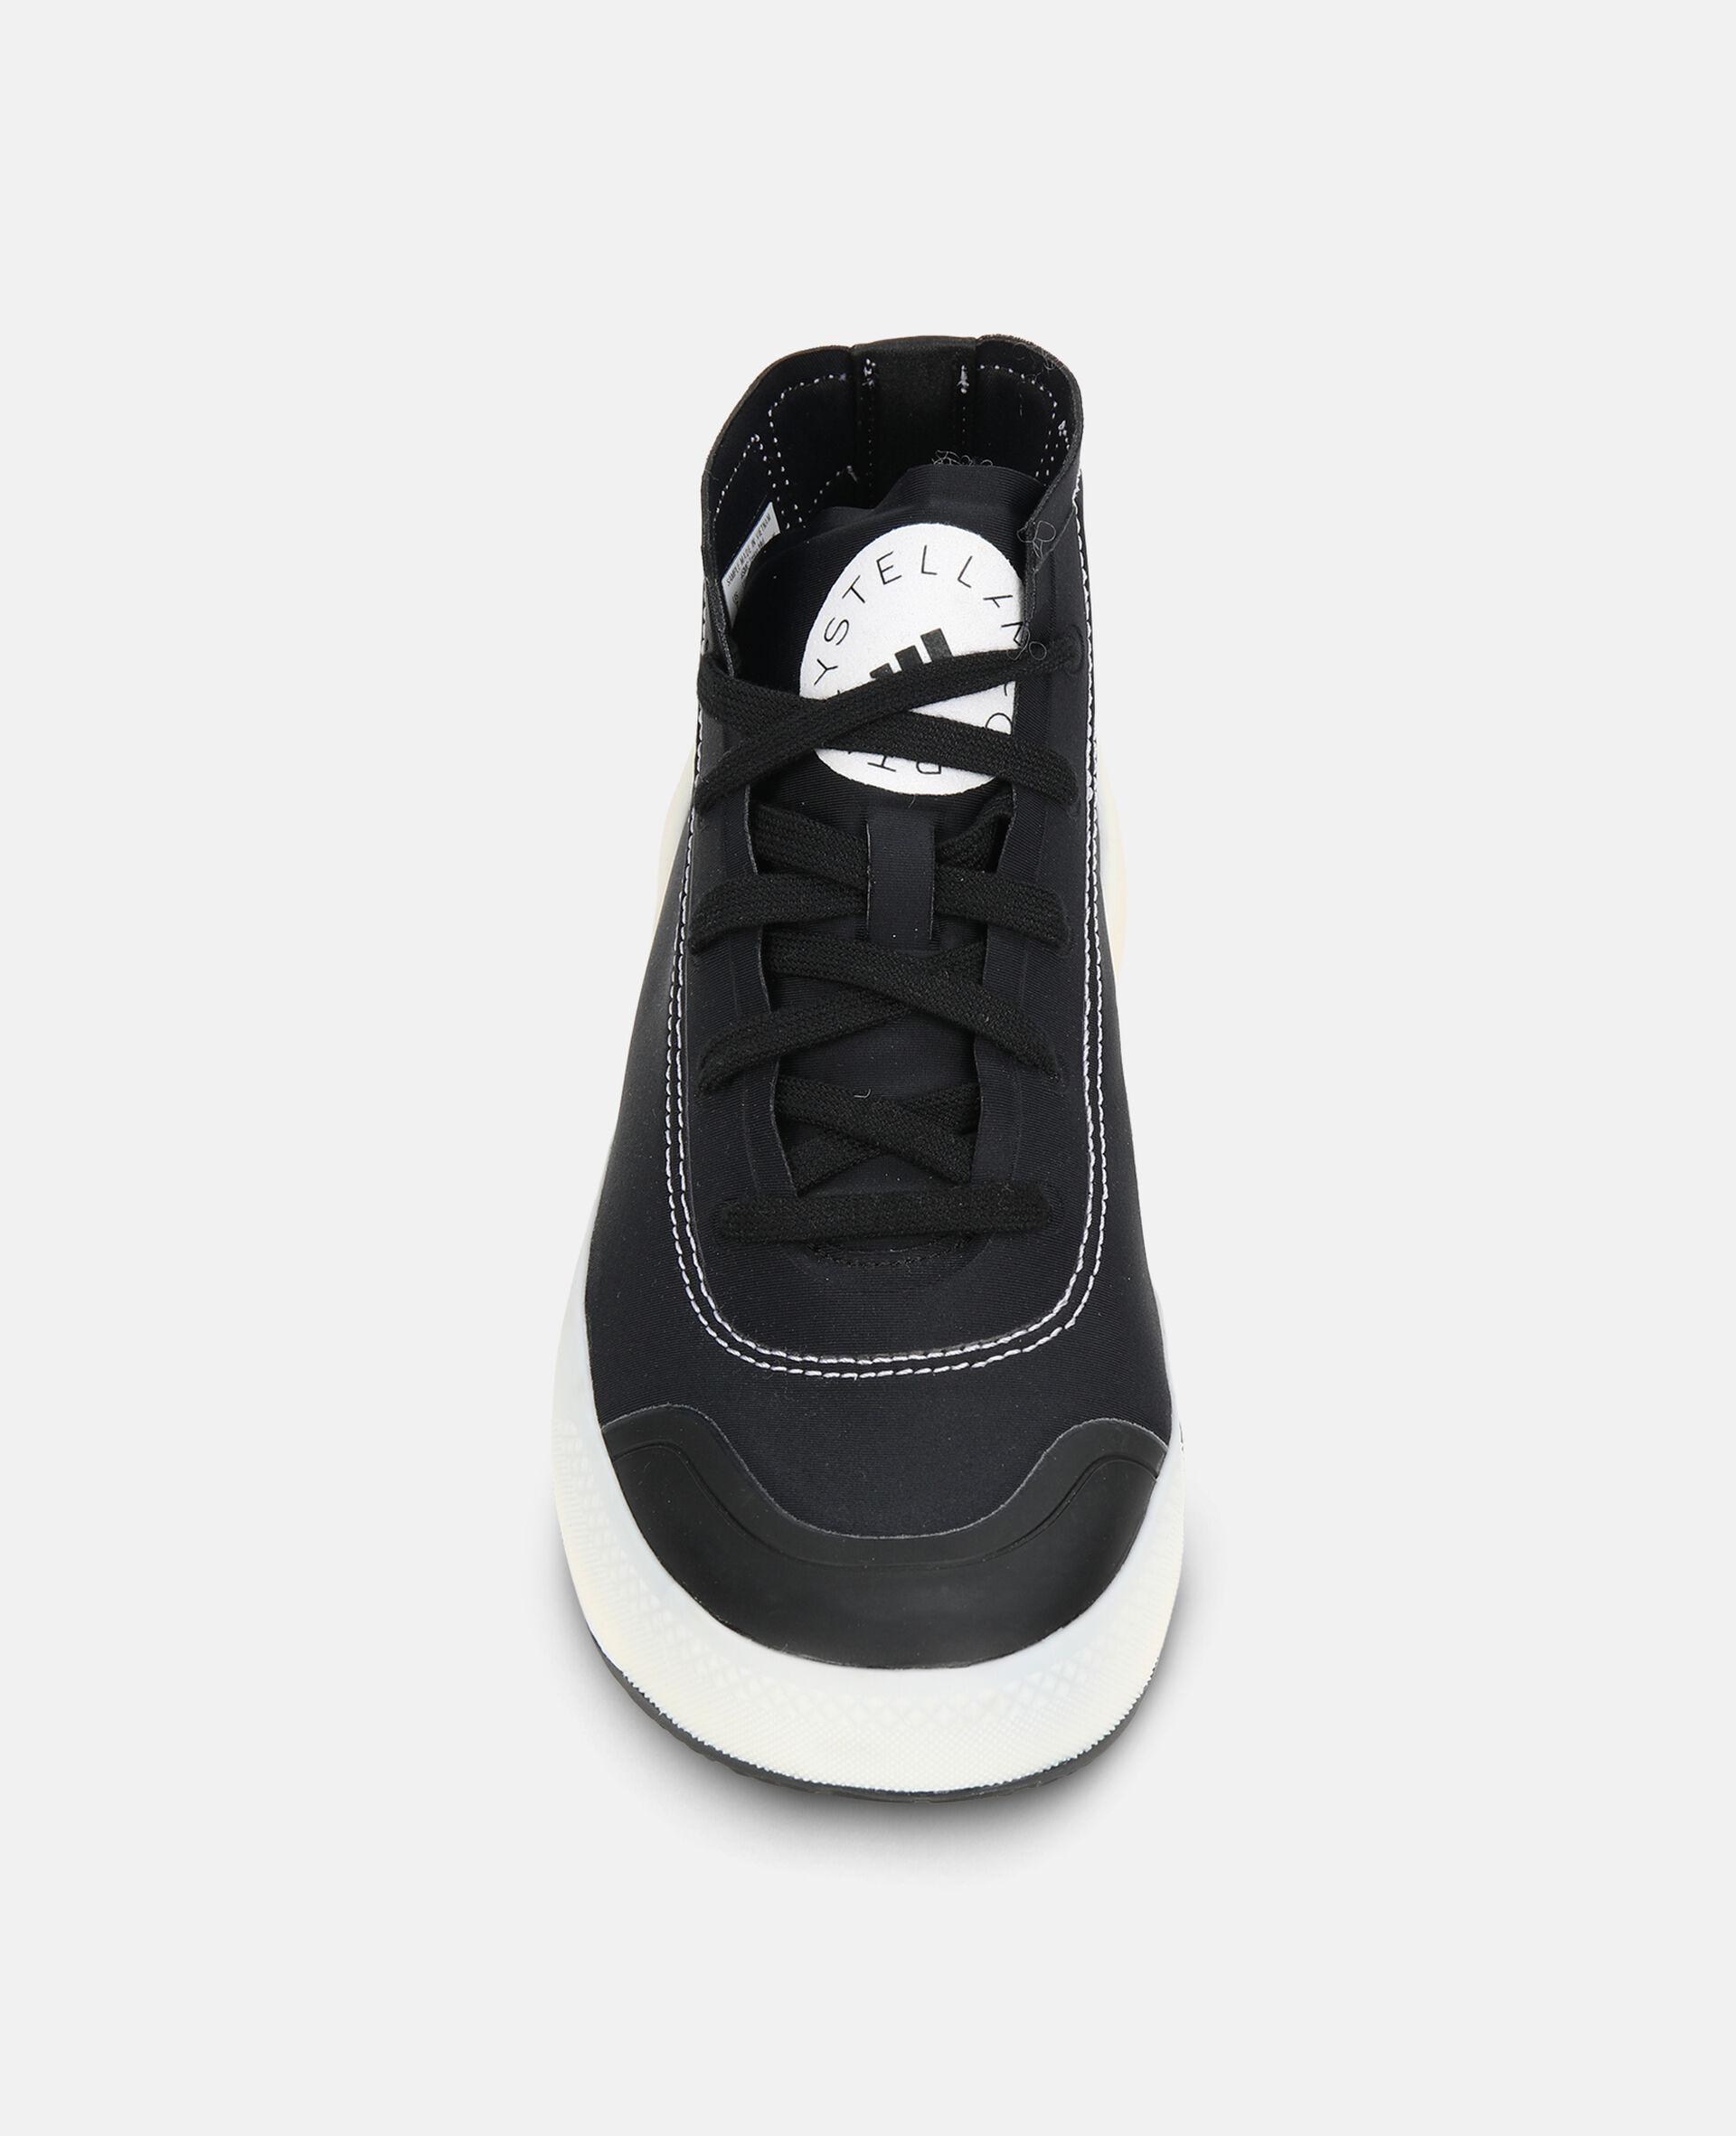 Black Boost Treino Sneakers-Black-large image number 4